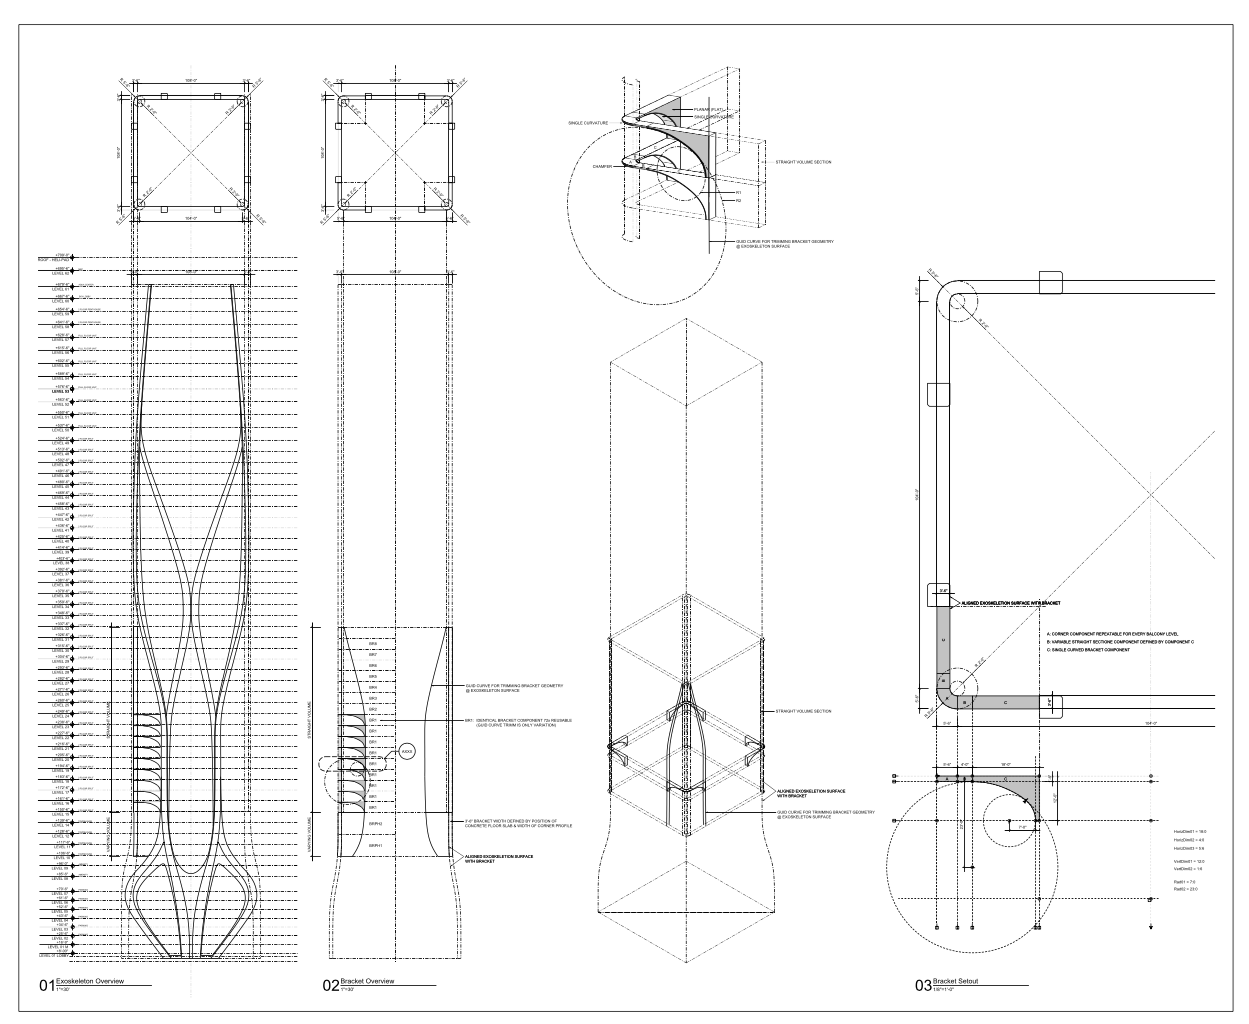 Zaha Hadid S Computer Drawings Of One Thousand Museum